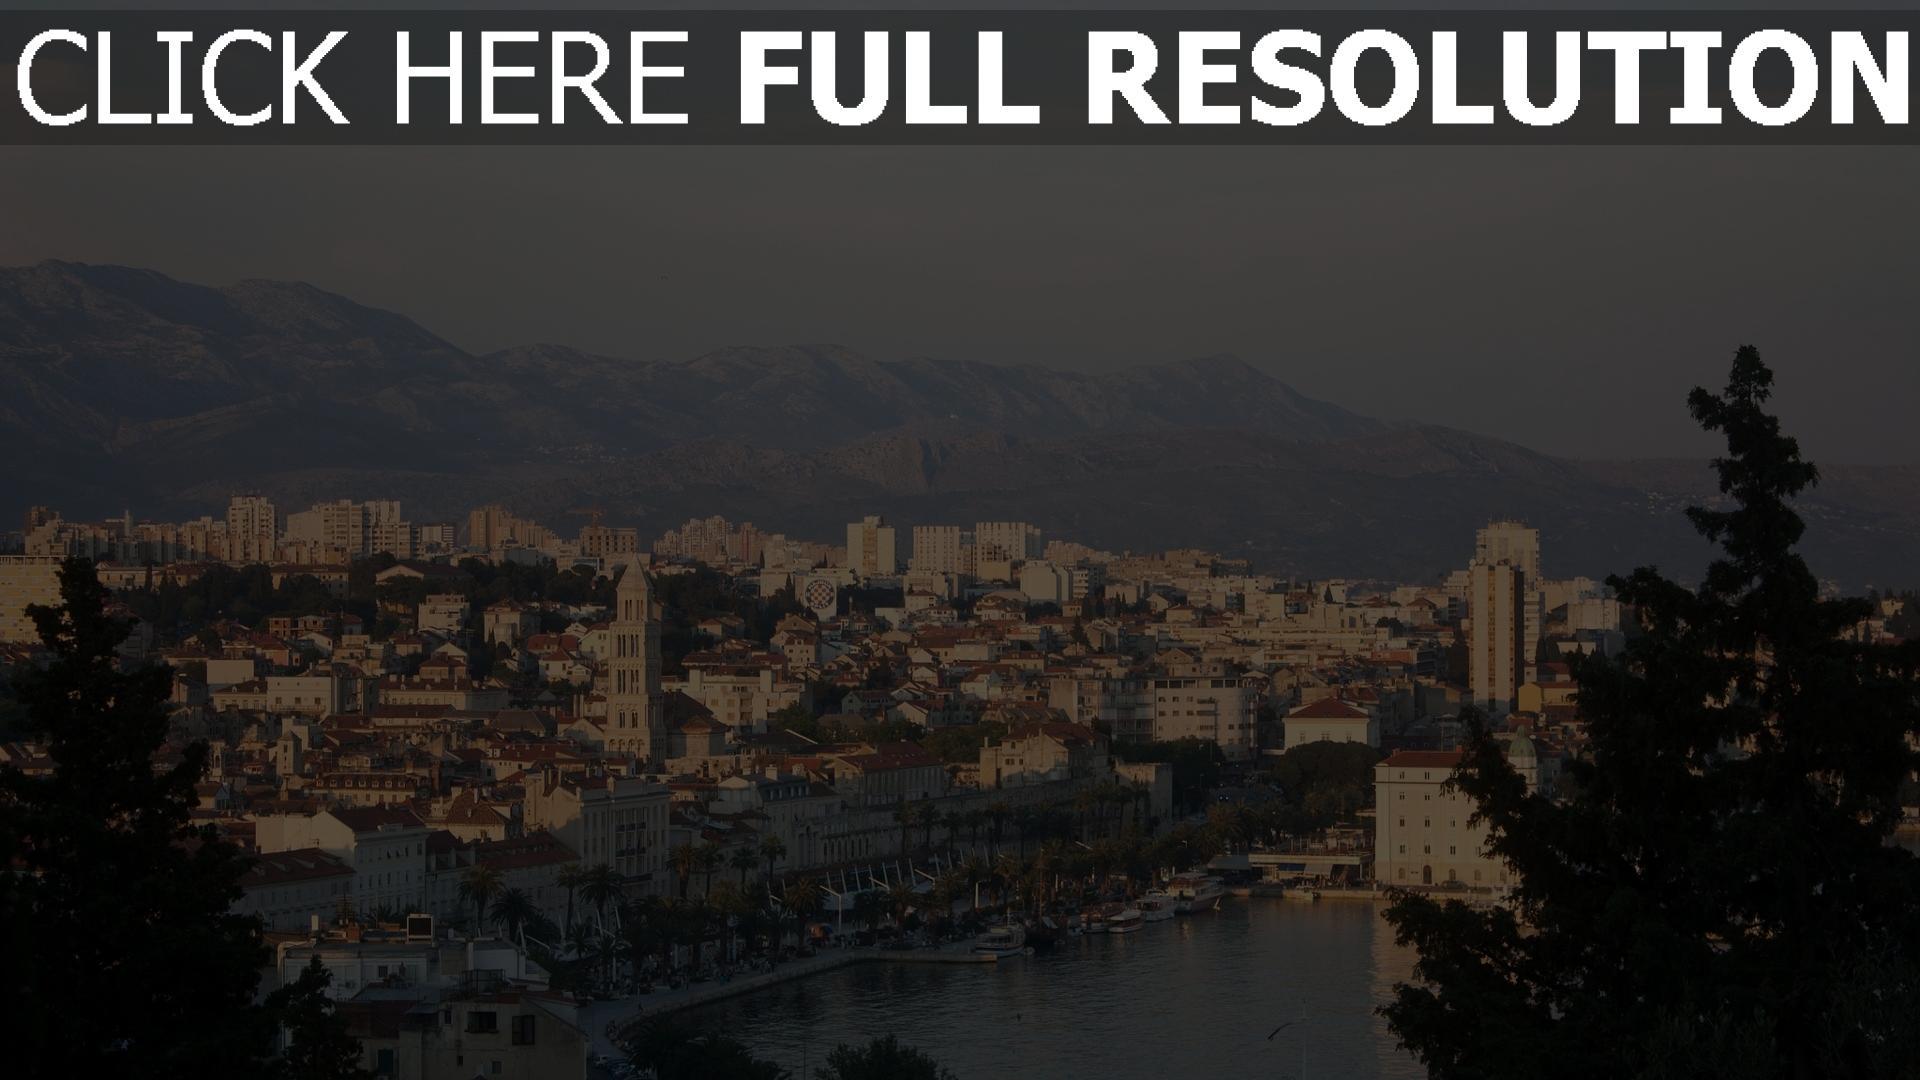 hd hintergrundbilder kroatien dalmatien adria mittelmeer europa 1920x1080